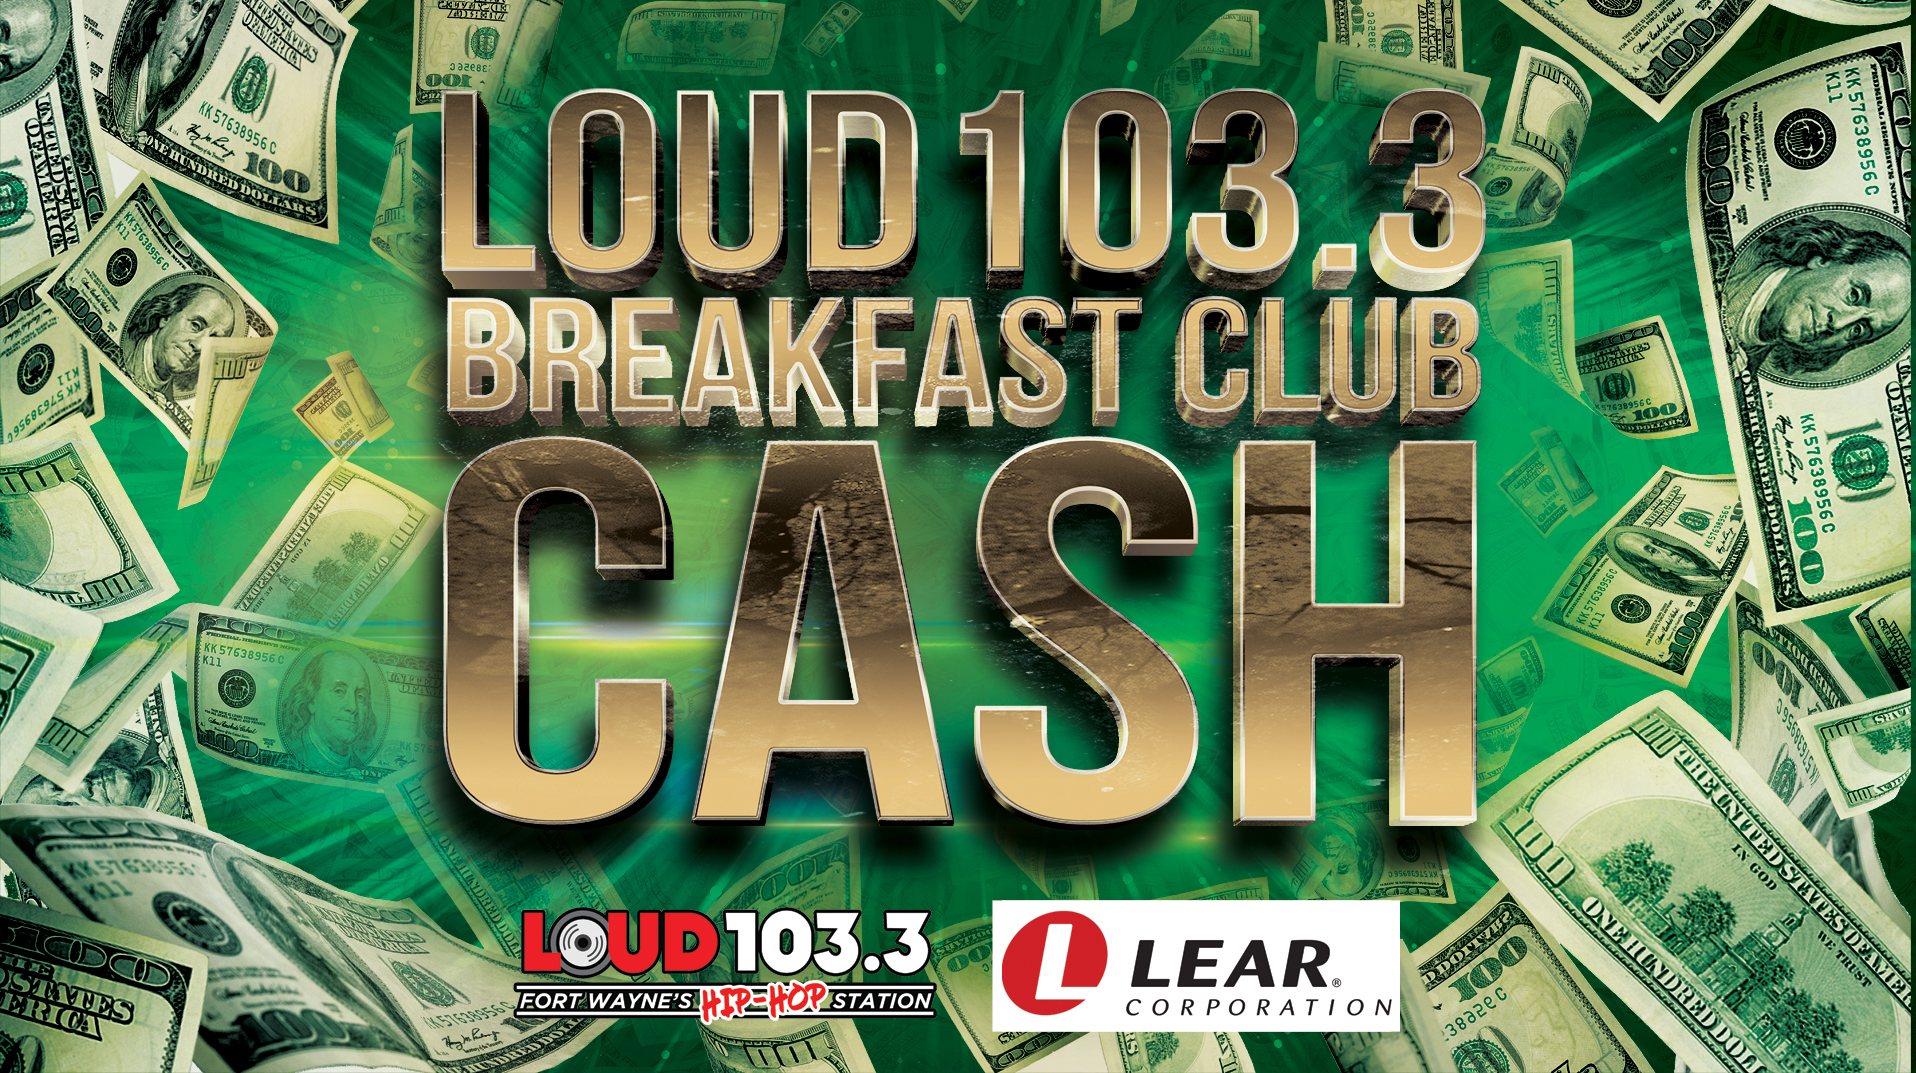 Breakfast Club Cash!